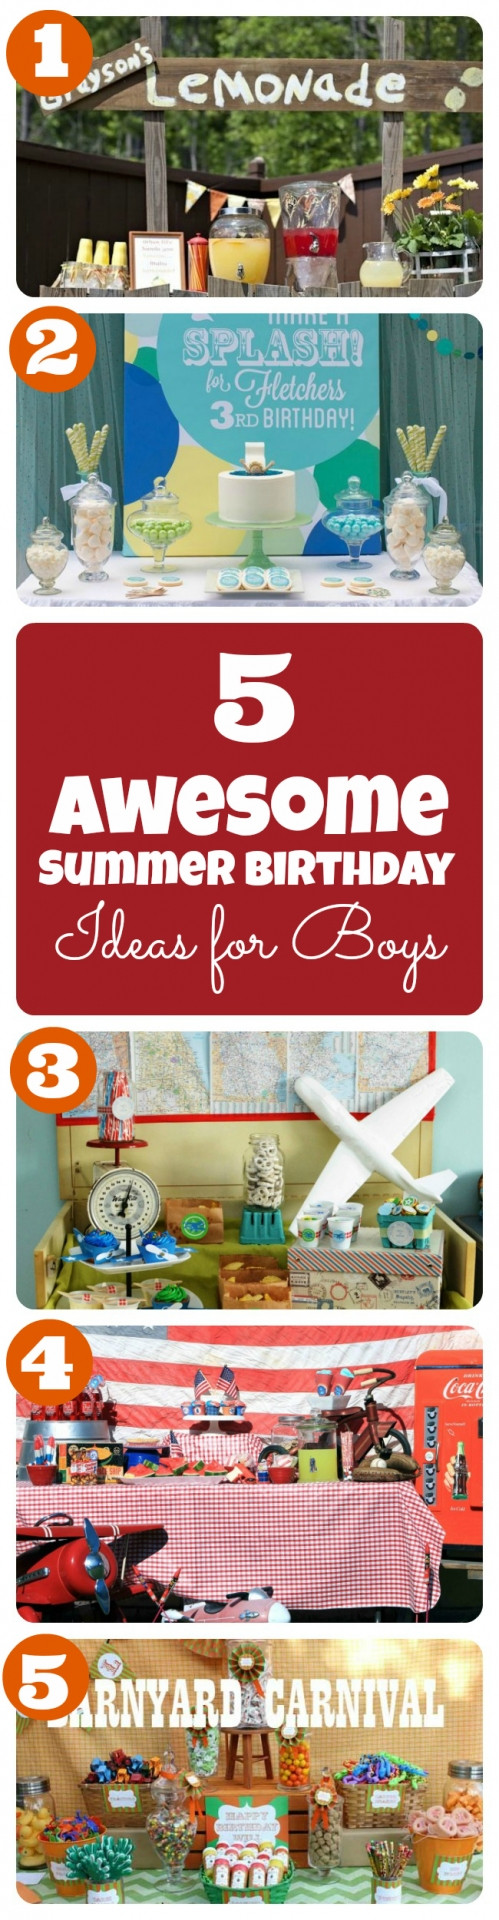 Summer Birthday Party Ideas For Boys  Summer Birthday Party Theme Ideas for Boys